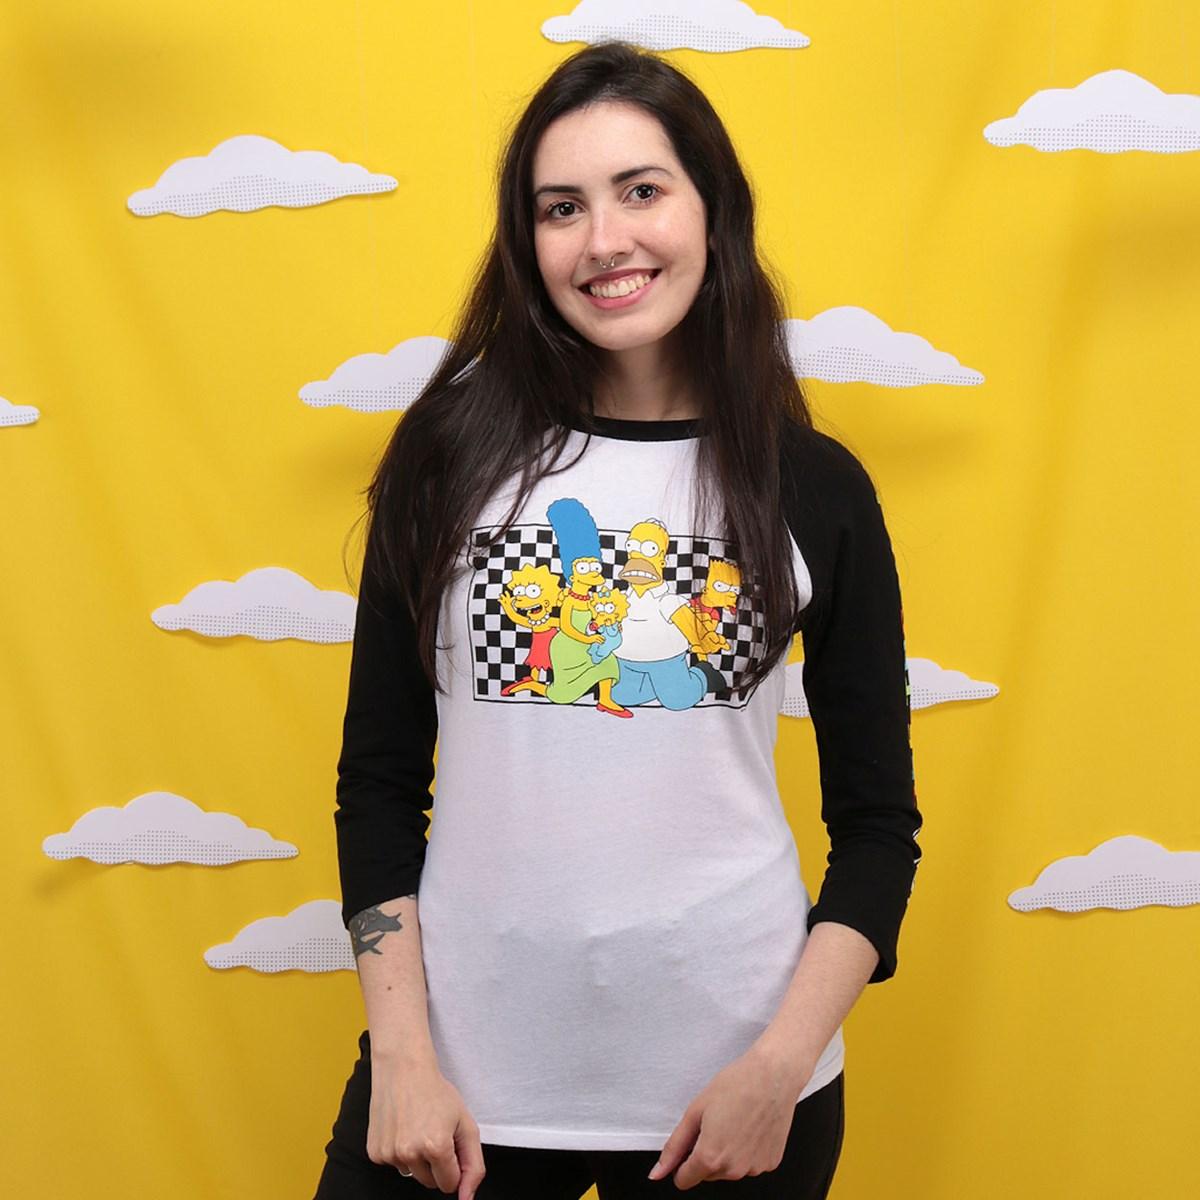 Camiseta Vans The Simpsons Family Raglan VN0A4V47ZZZ